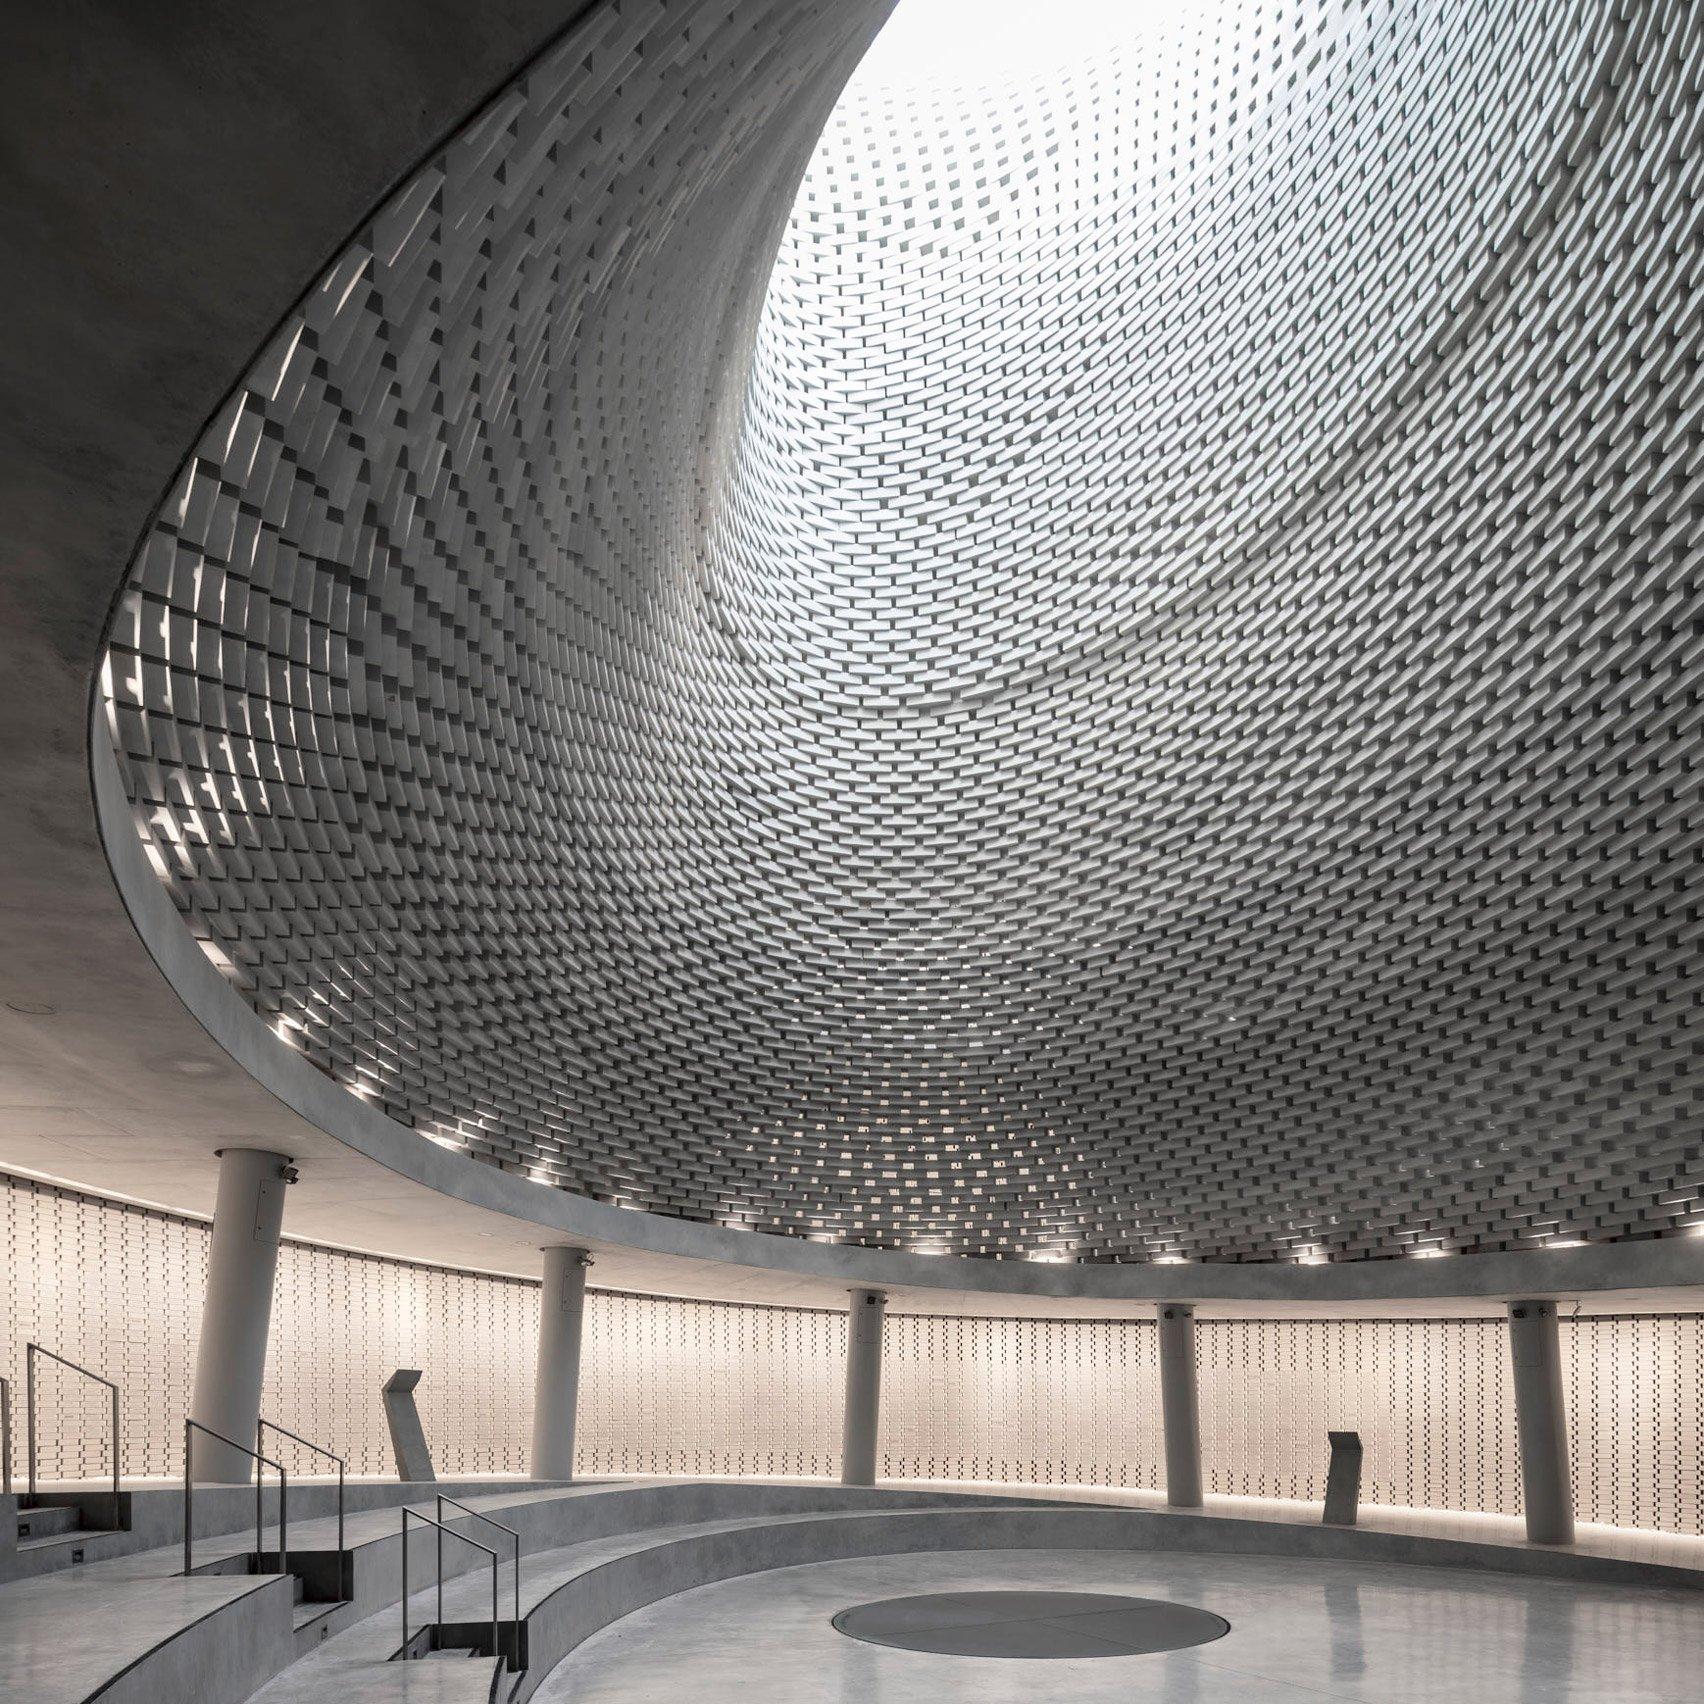 Spiralling memorial by Kimmel Eshkolot is dedicated to